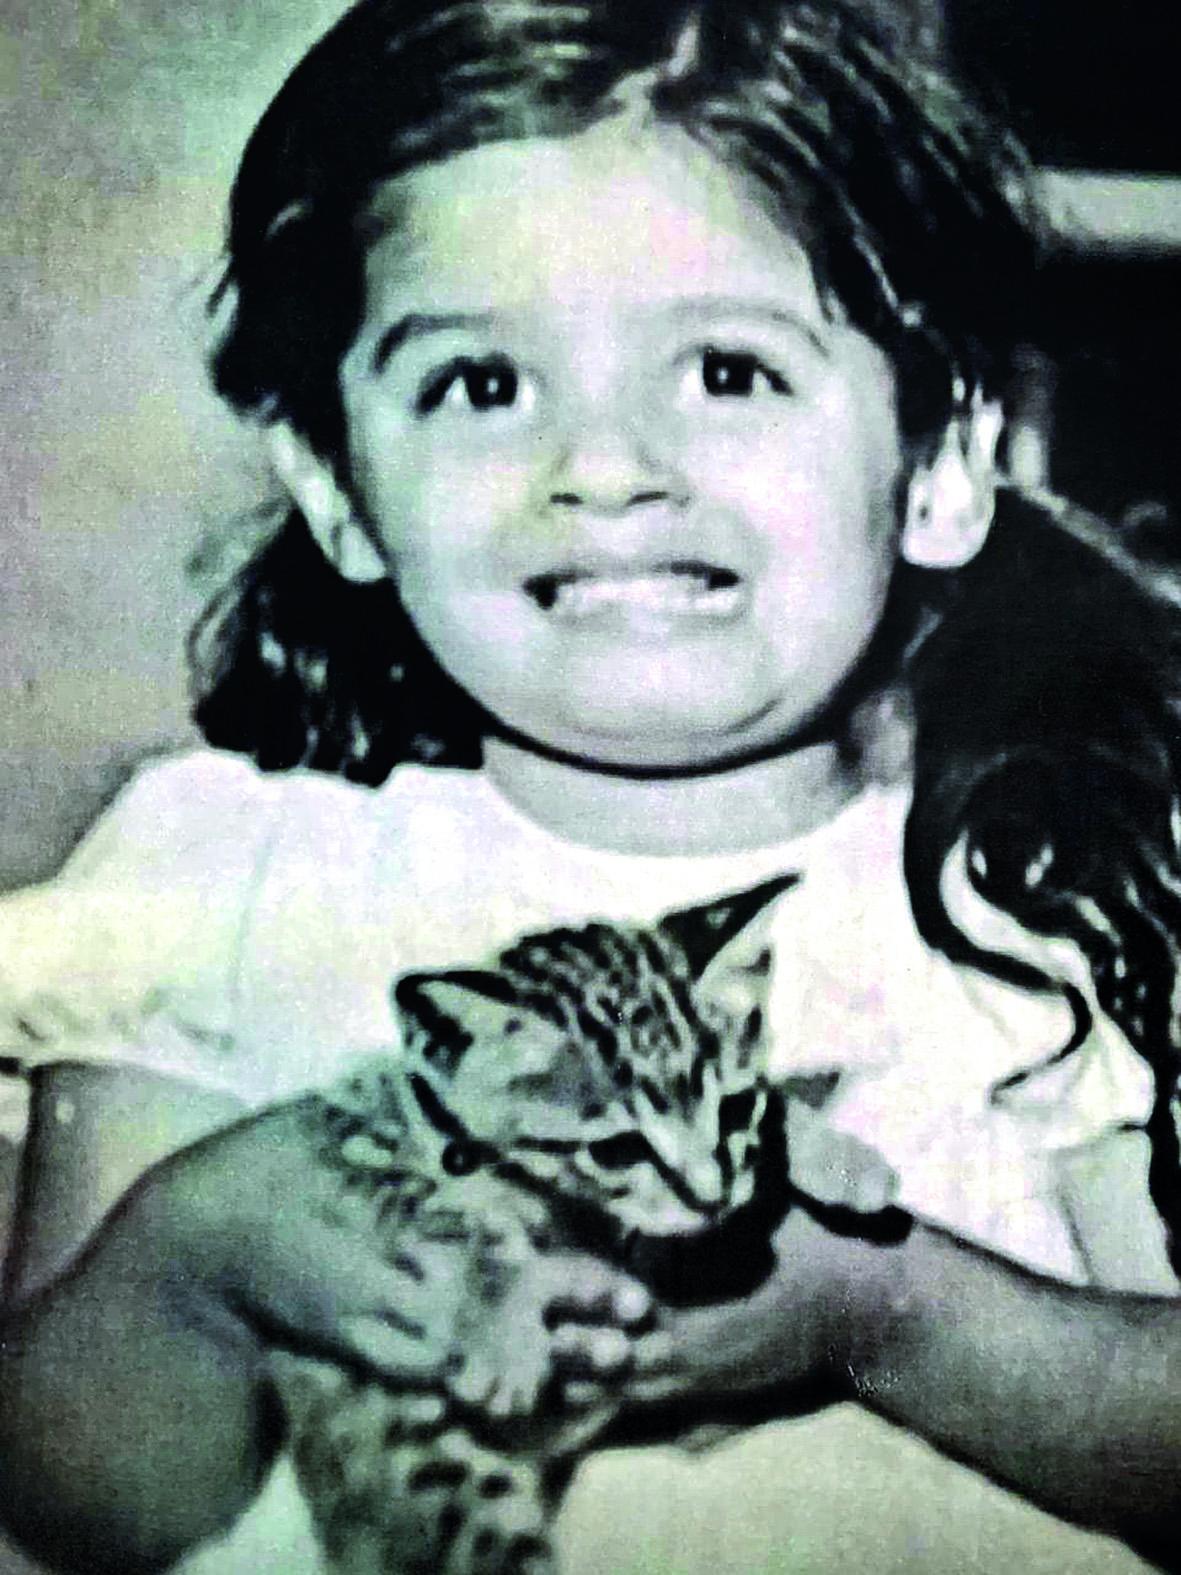 CHILDREN_RAVEENA TANDON WITH HER KITTEN